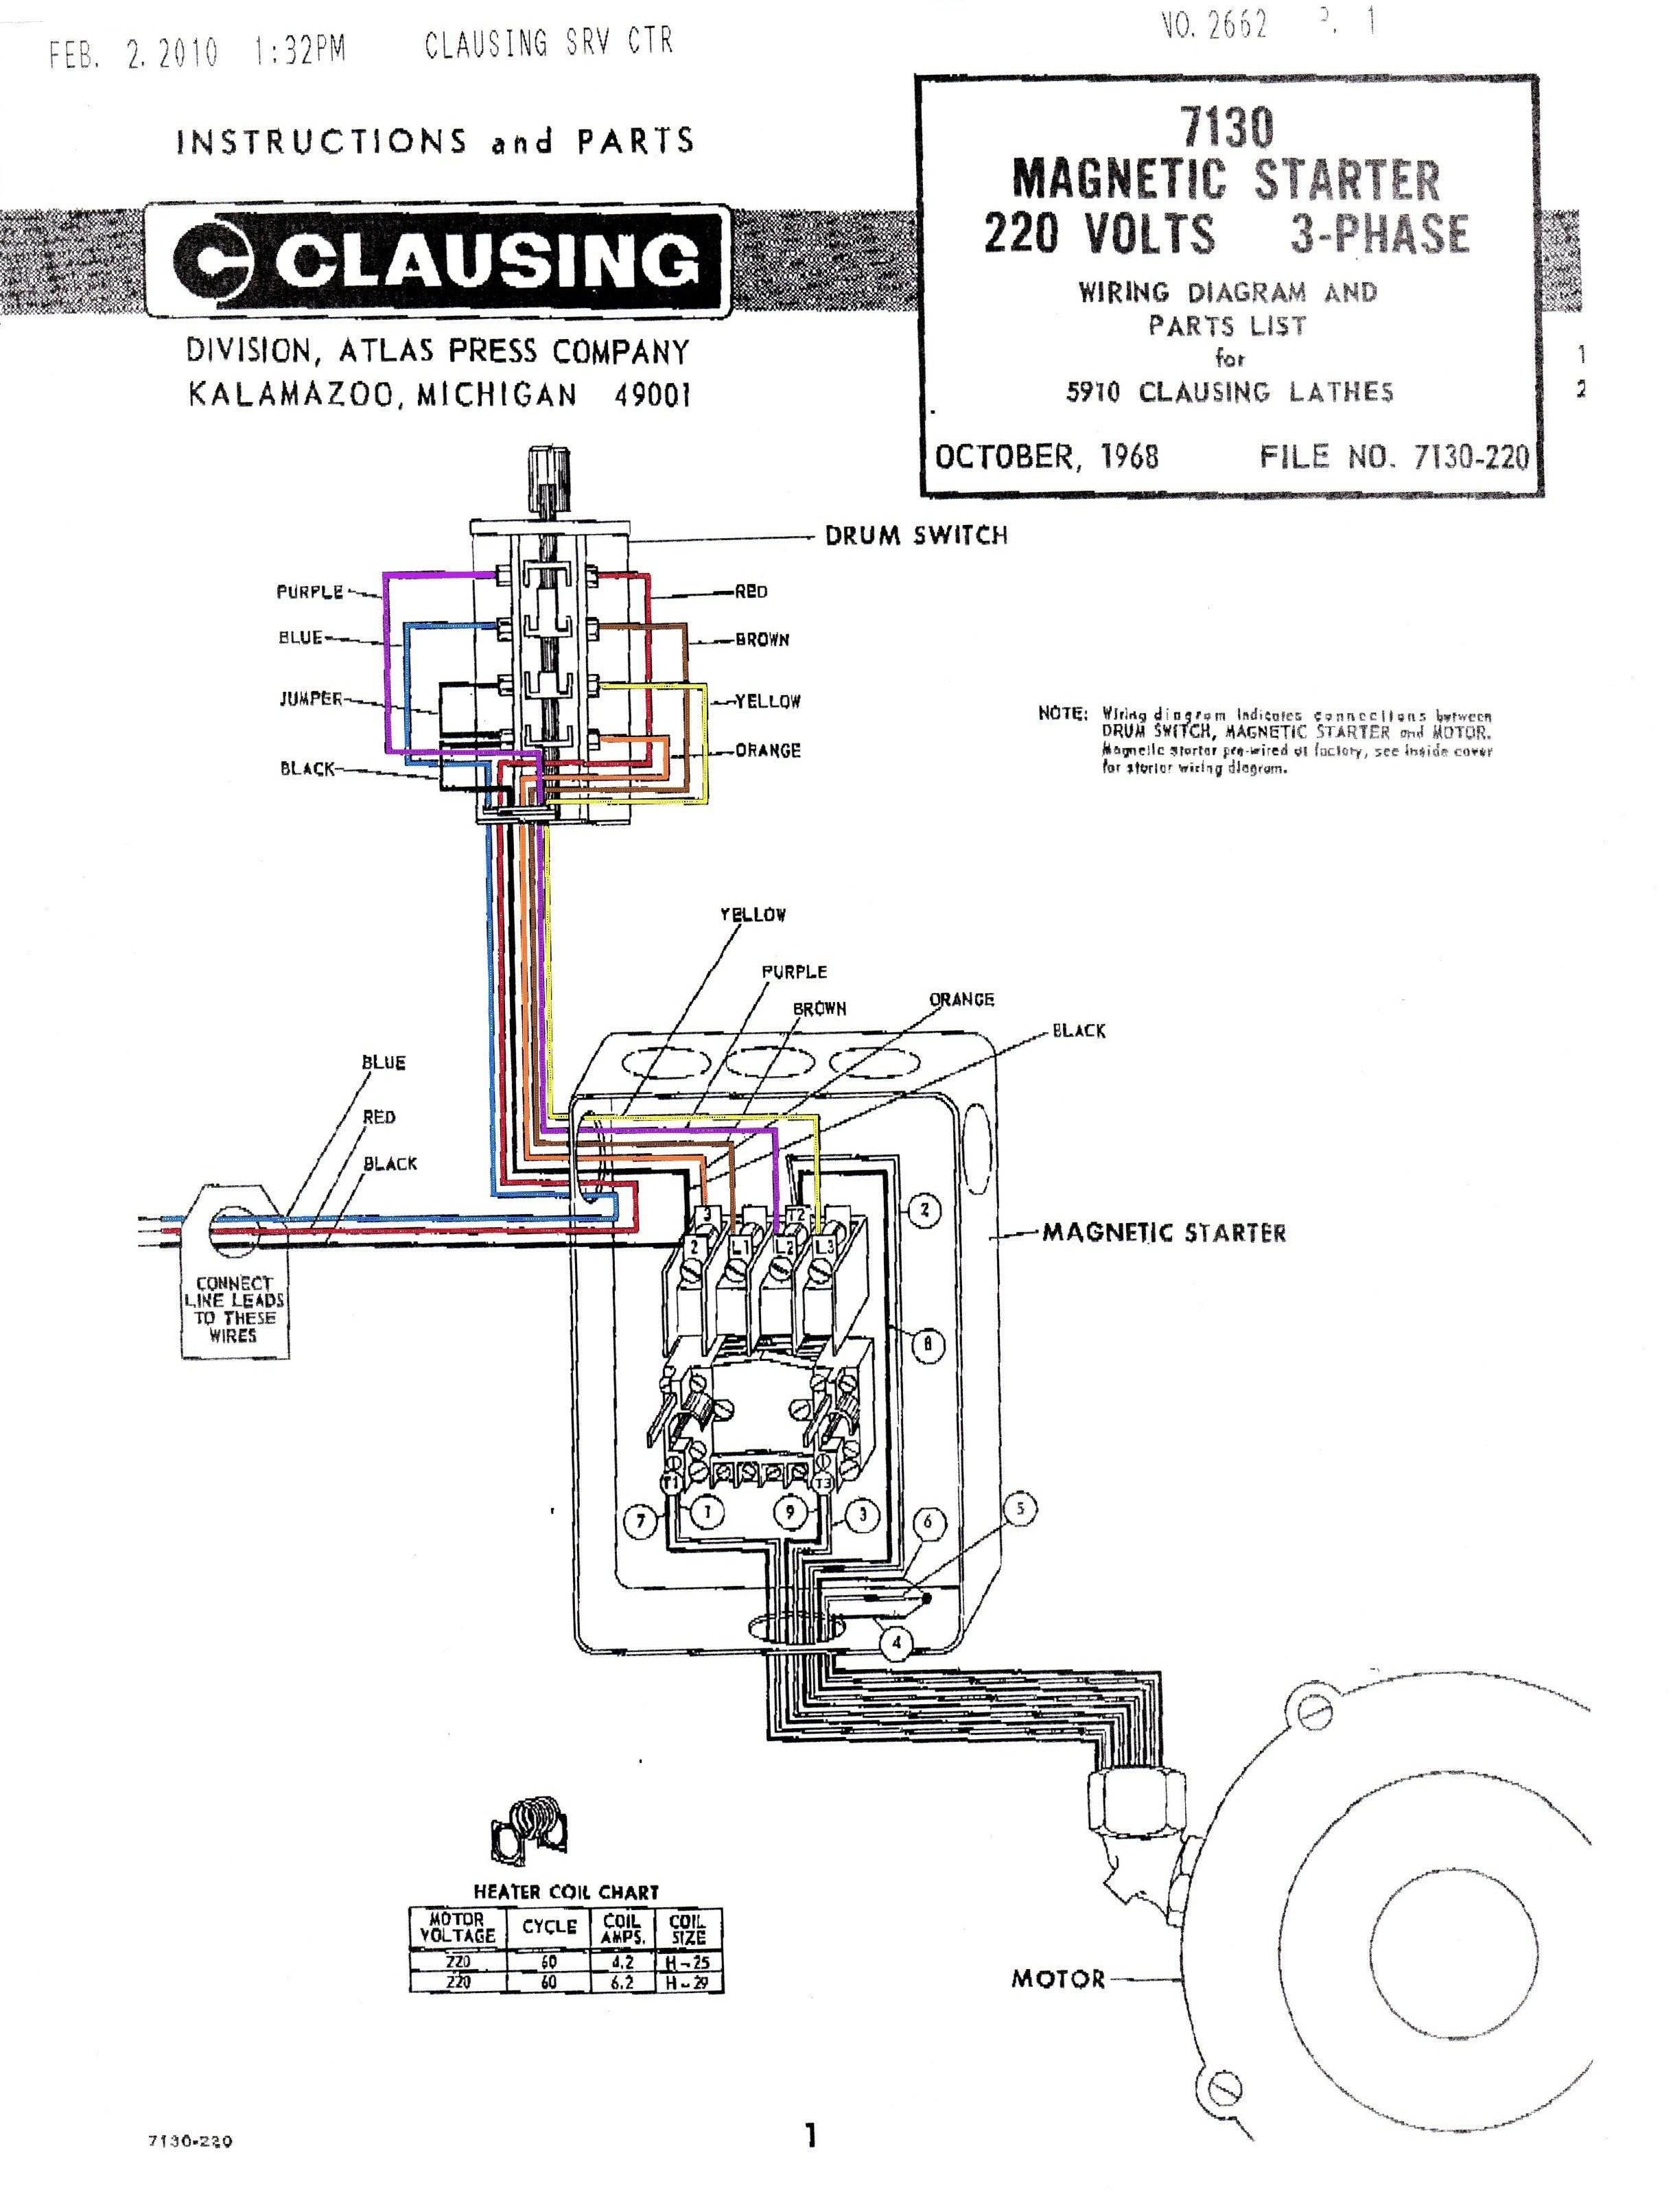 Magnetic Starter Wiring Diagram Unique Wiring Diagram for Bathroom Mirror New Electric Motor Brush Diagram